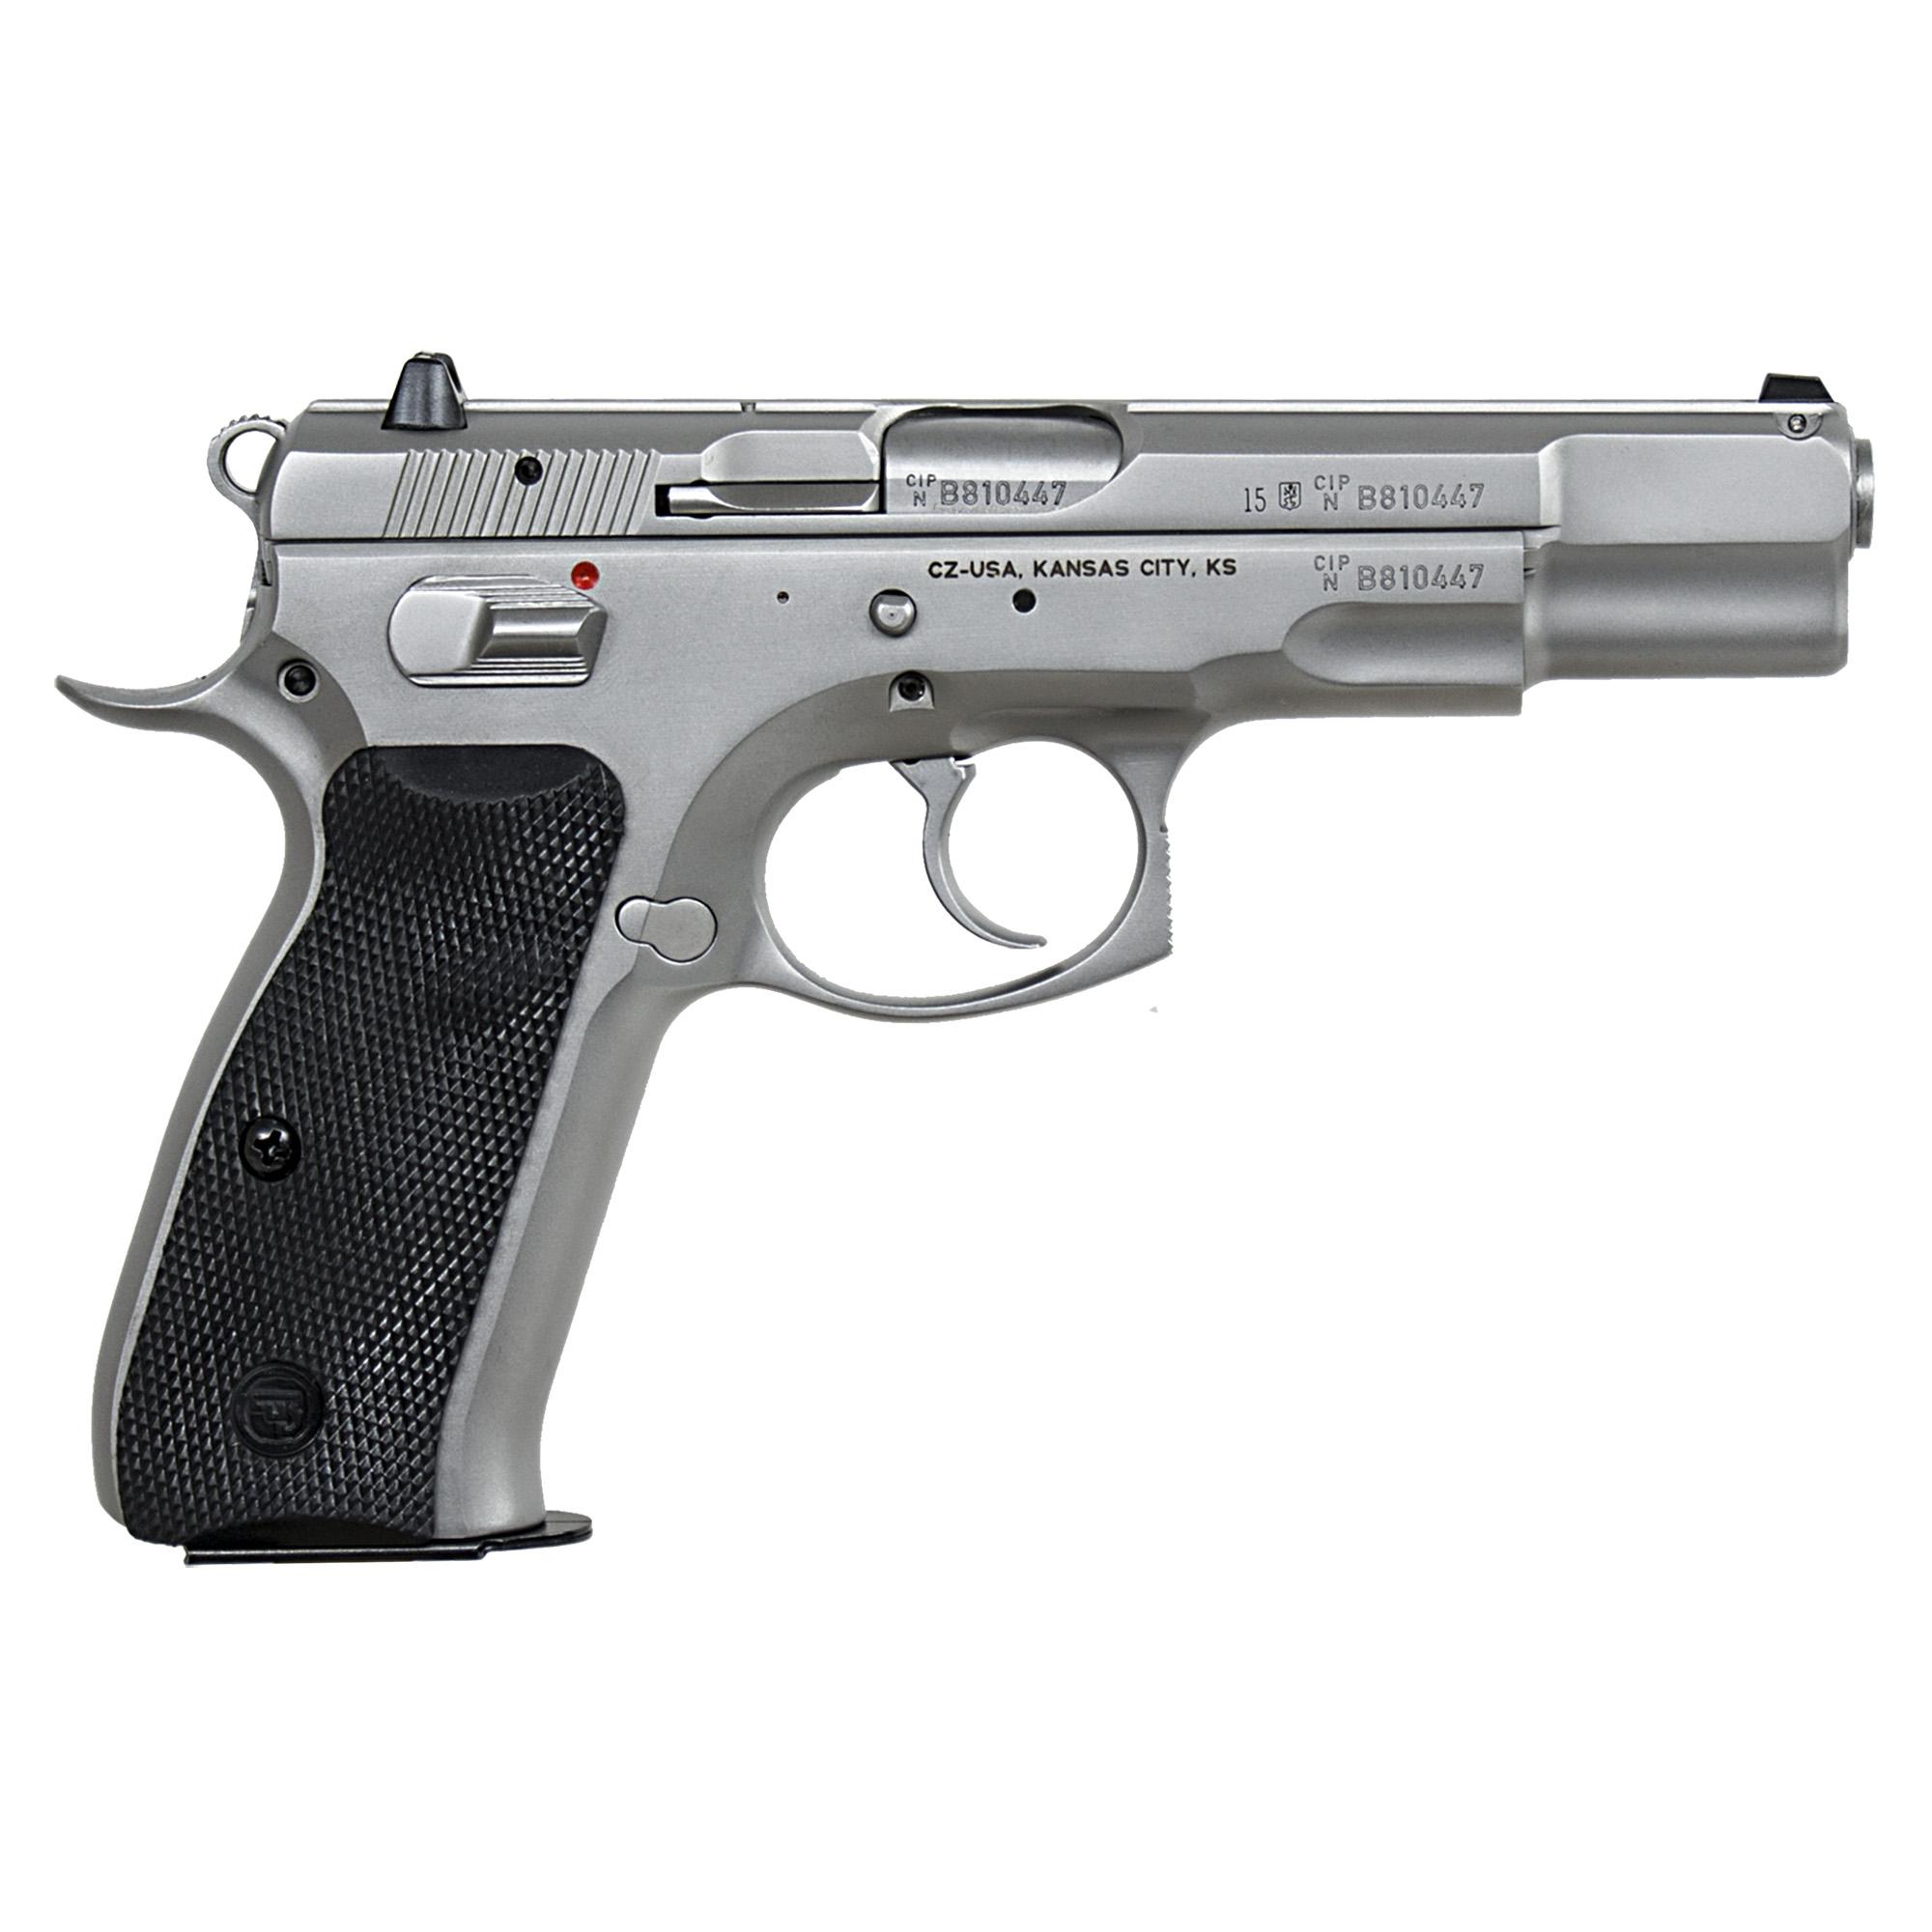 CZ 75B Matte Stainless 9mm · 91128 · DK Firearms